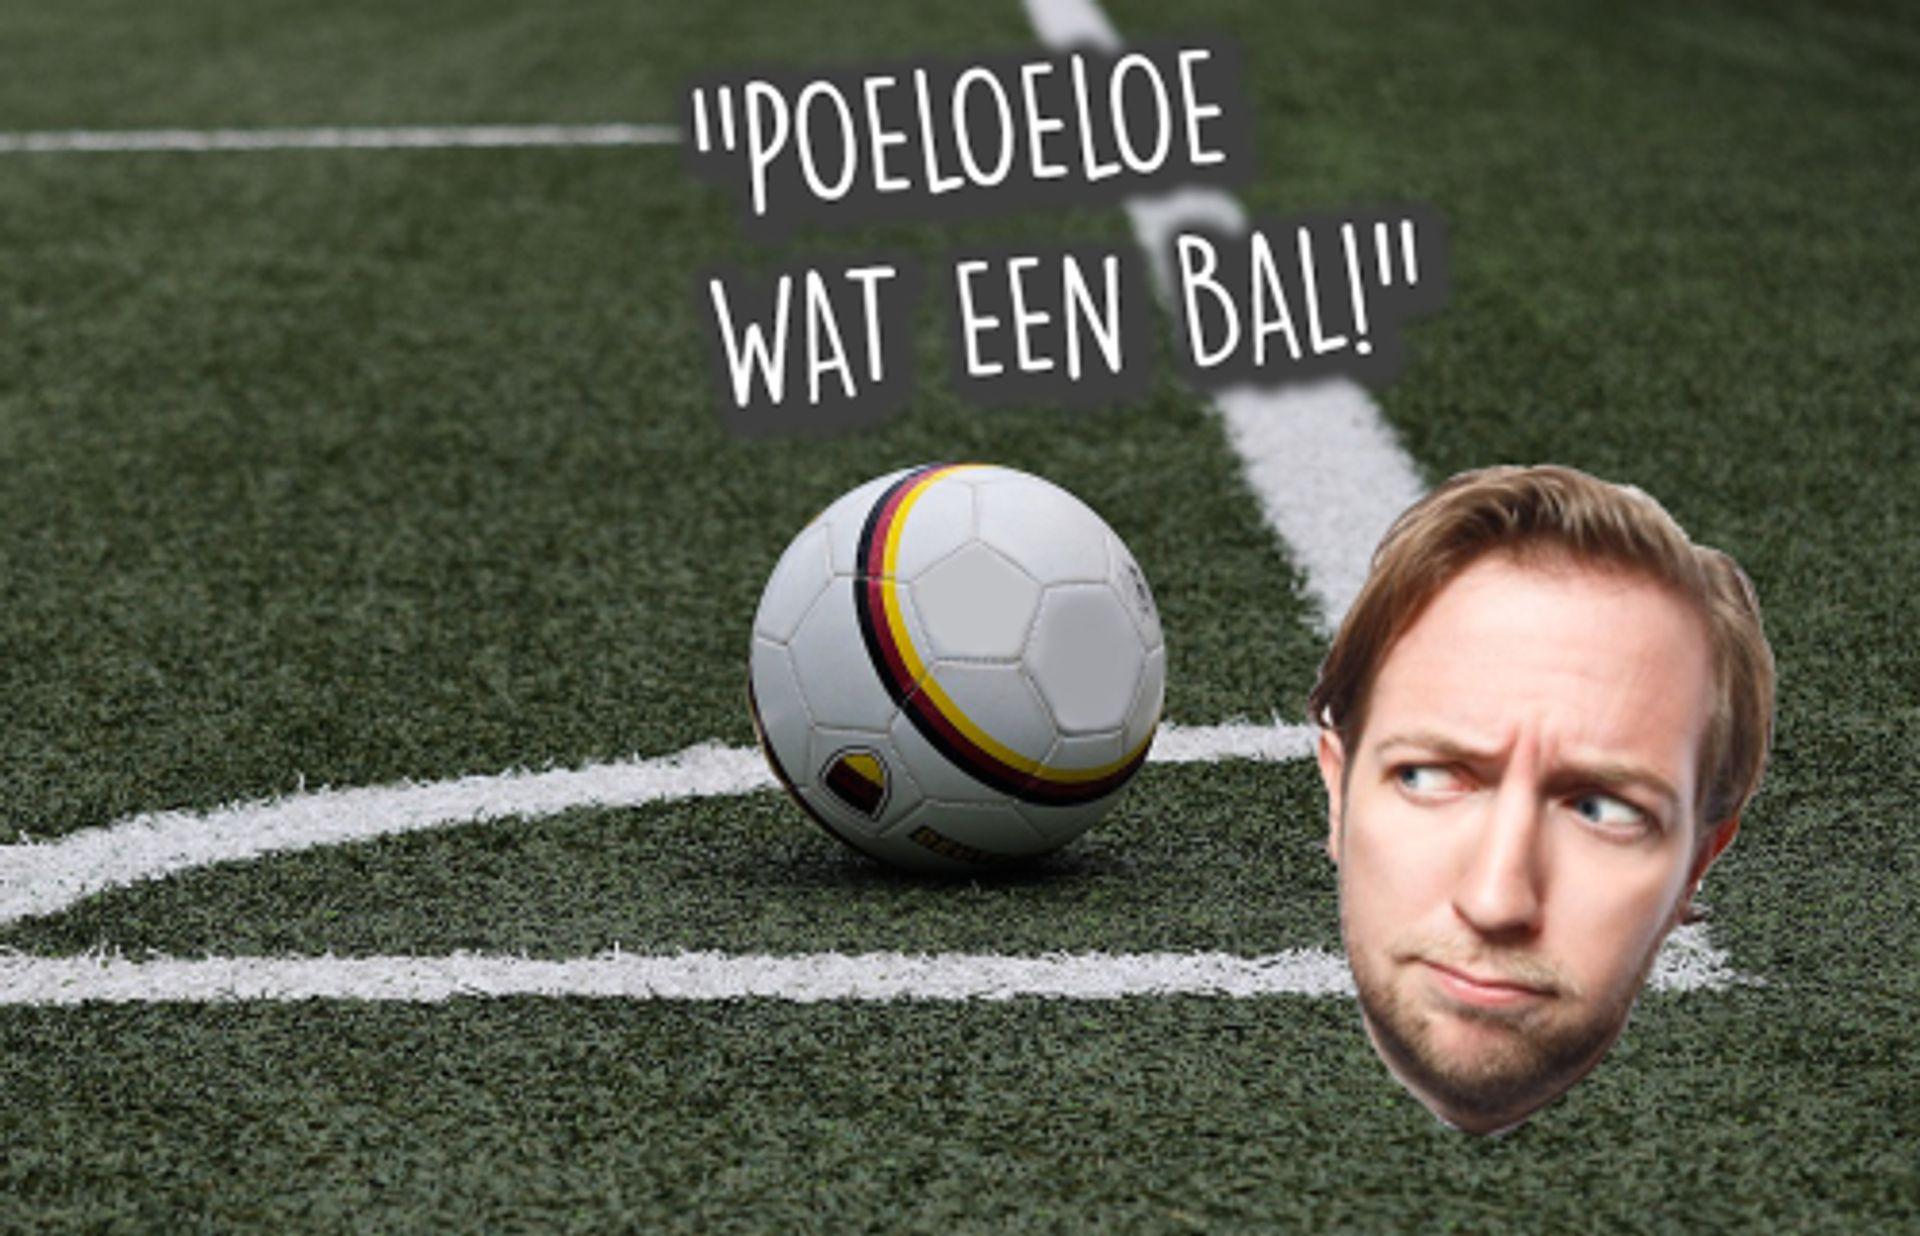 Rámon levert eigen commentaar op FIFA